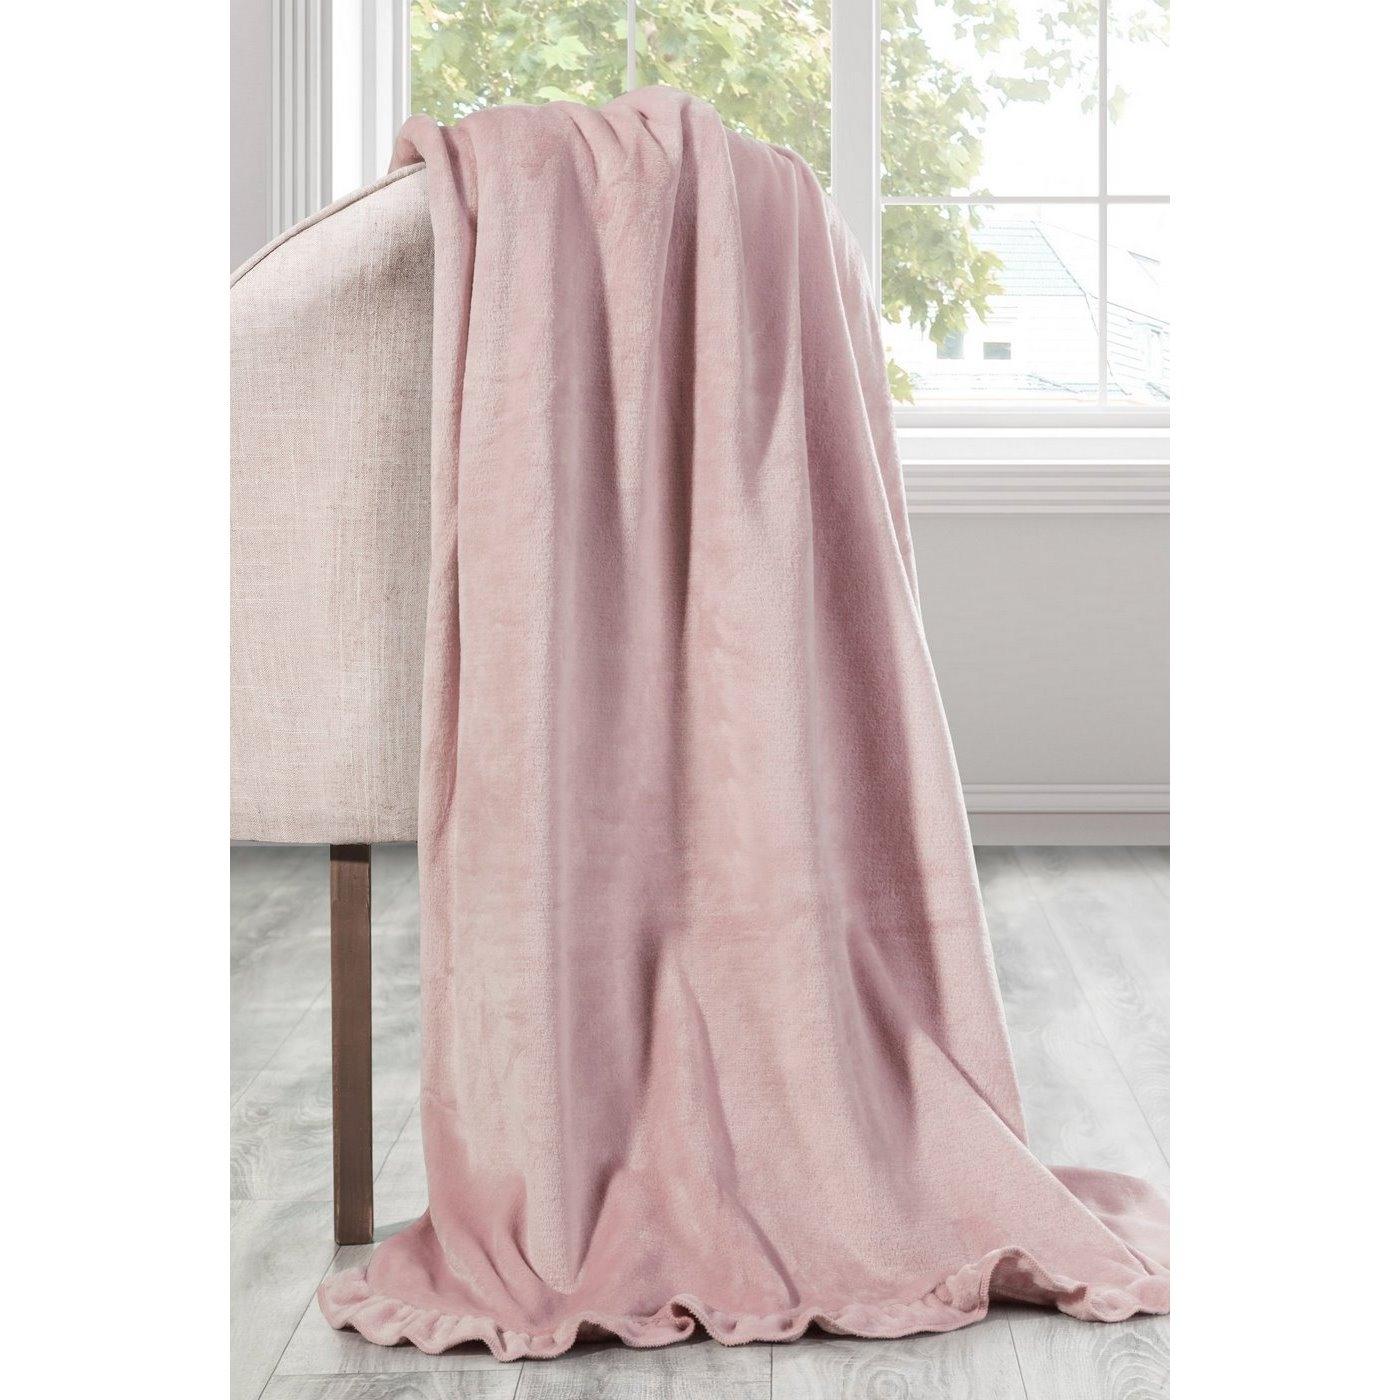 Patura Freya Pink 150 x 200 cm